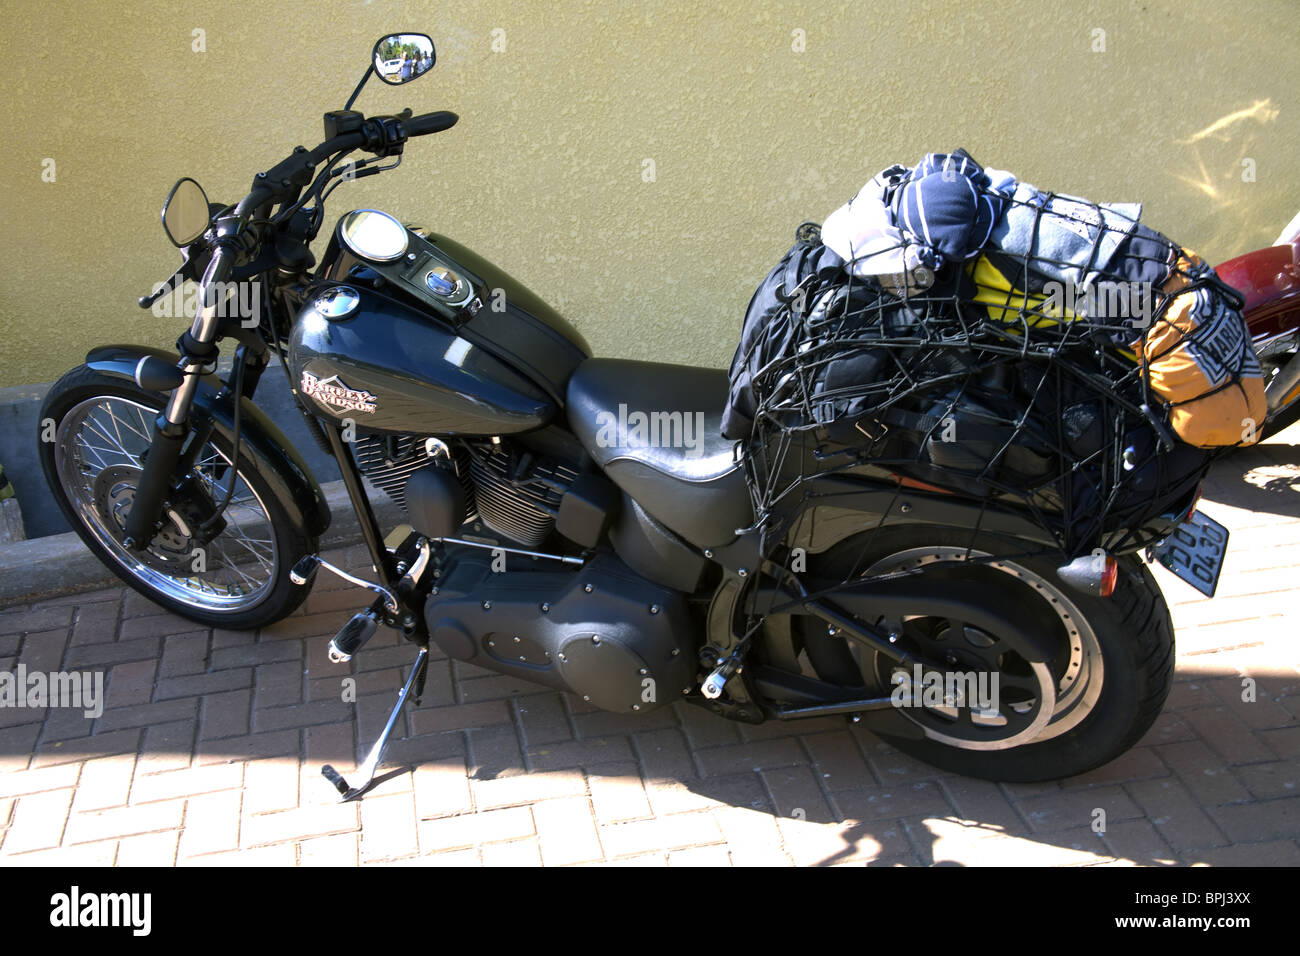 harley davidson motorrad verpackt mit gep ck f r die reise stockfoto bild 31131042 alamy. Black Bedroom Furniture Sets. Home Design Ideas